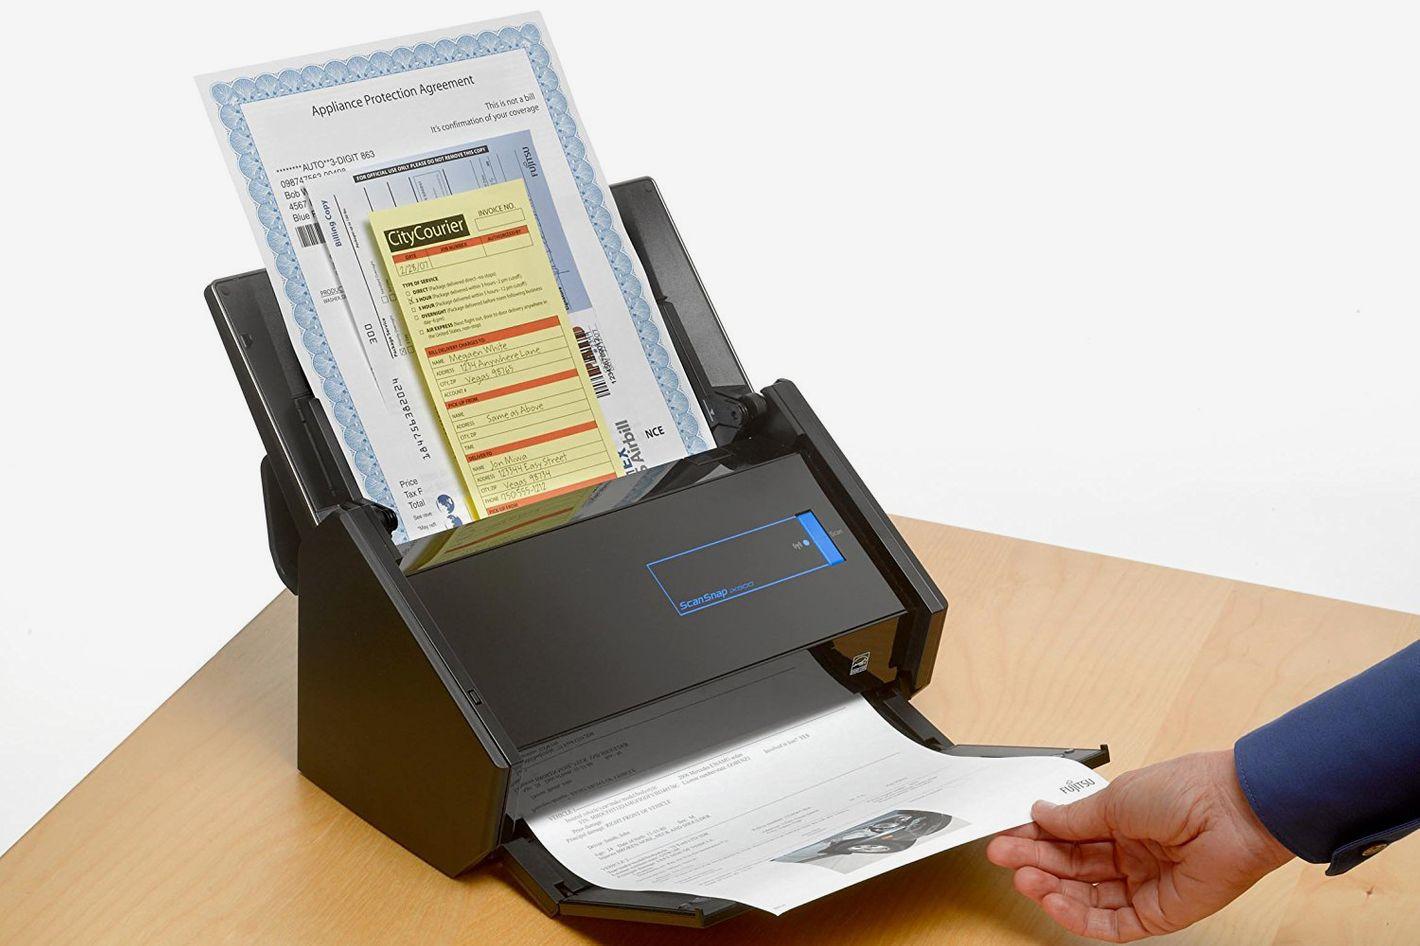 Fujitsu ScanSnap iX500 Color Duplex Desk Scanner